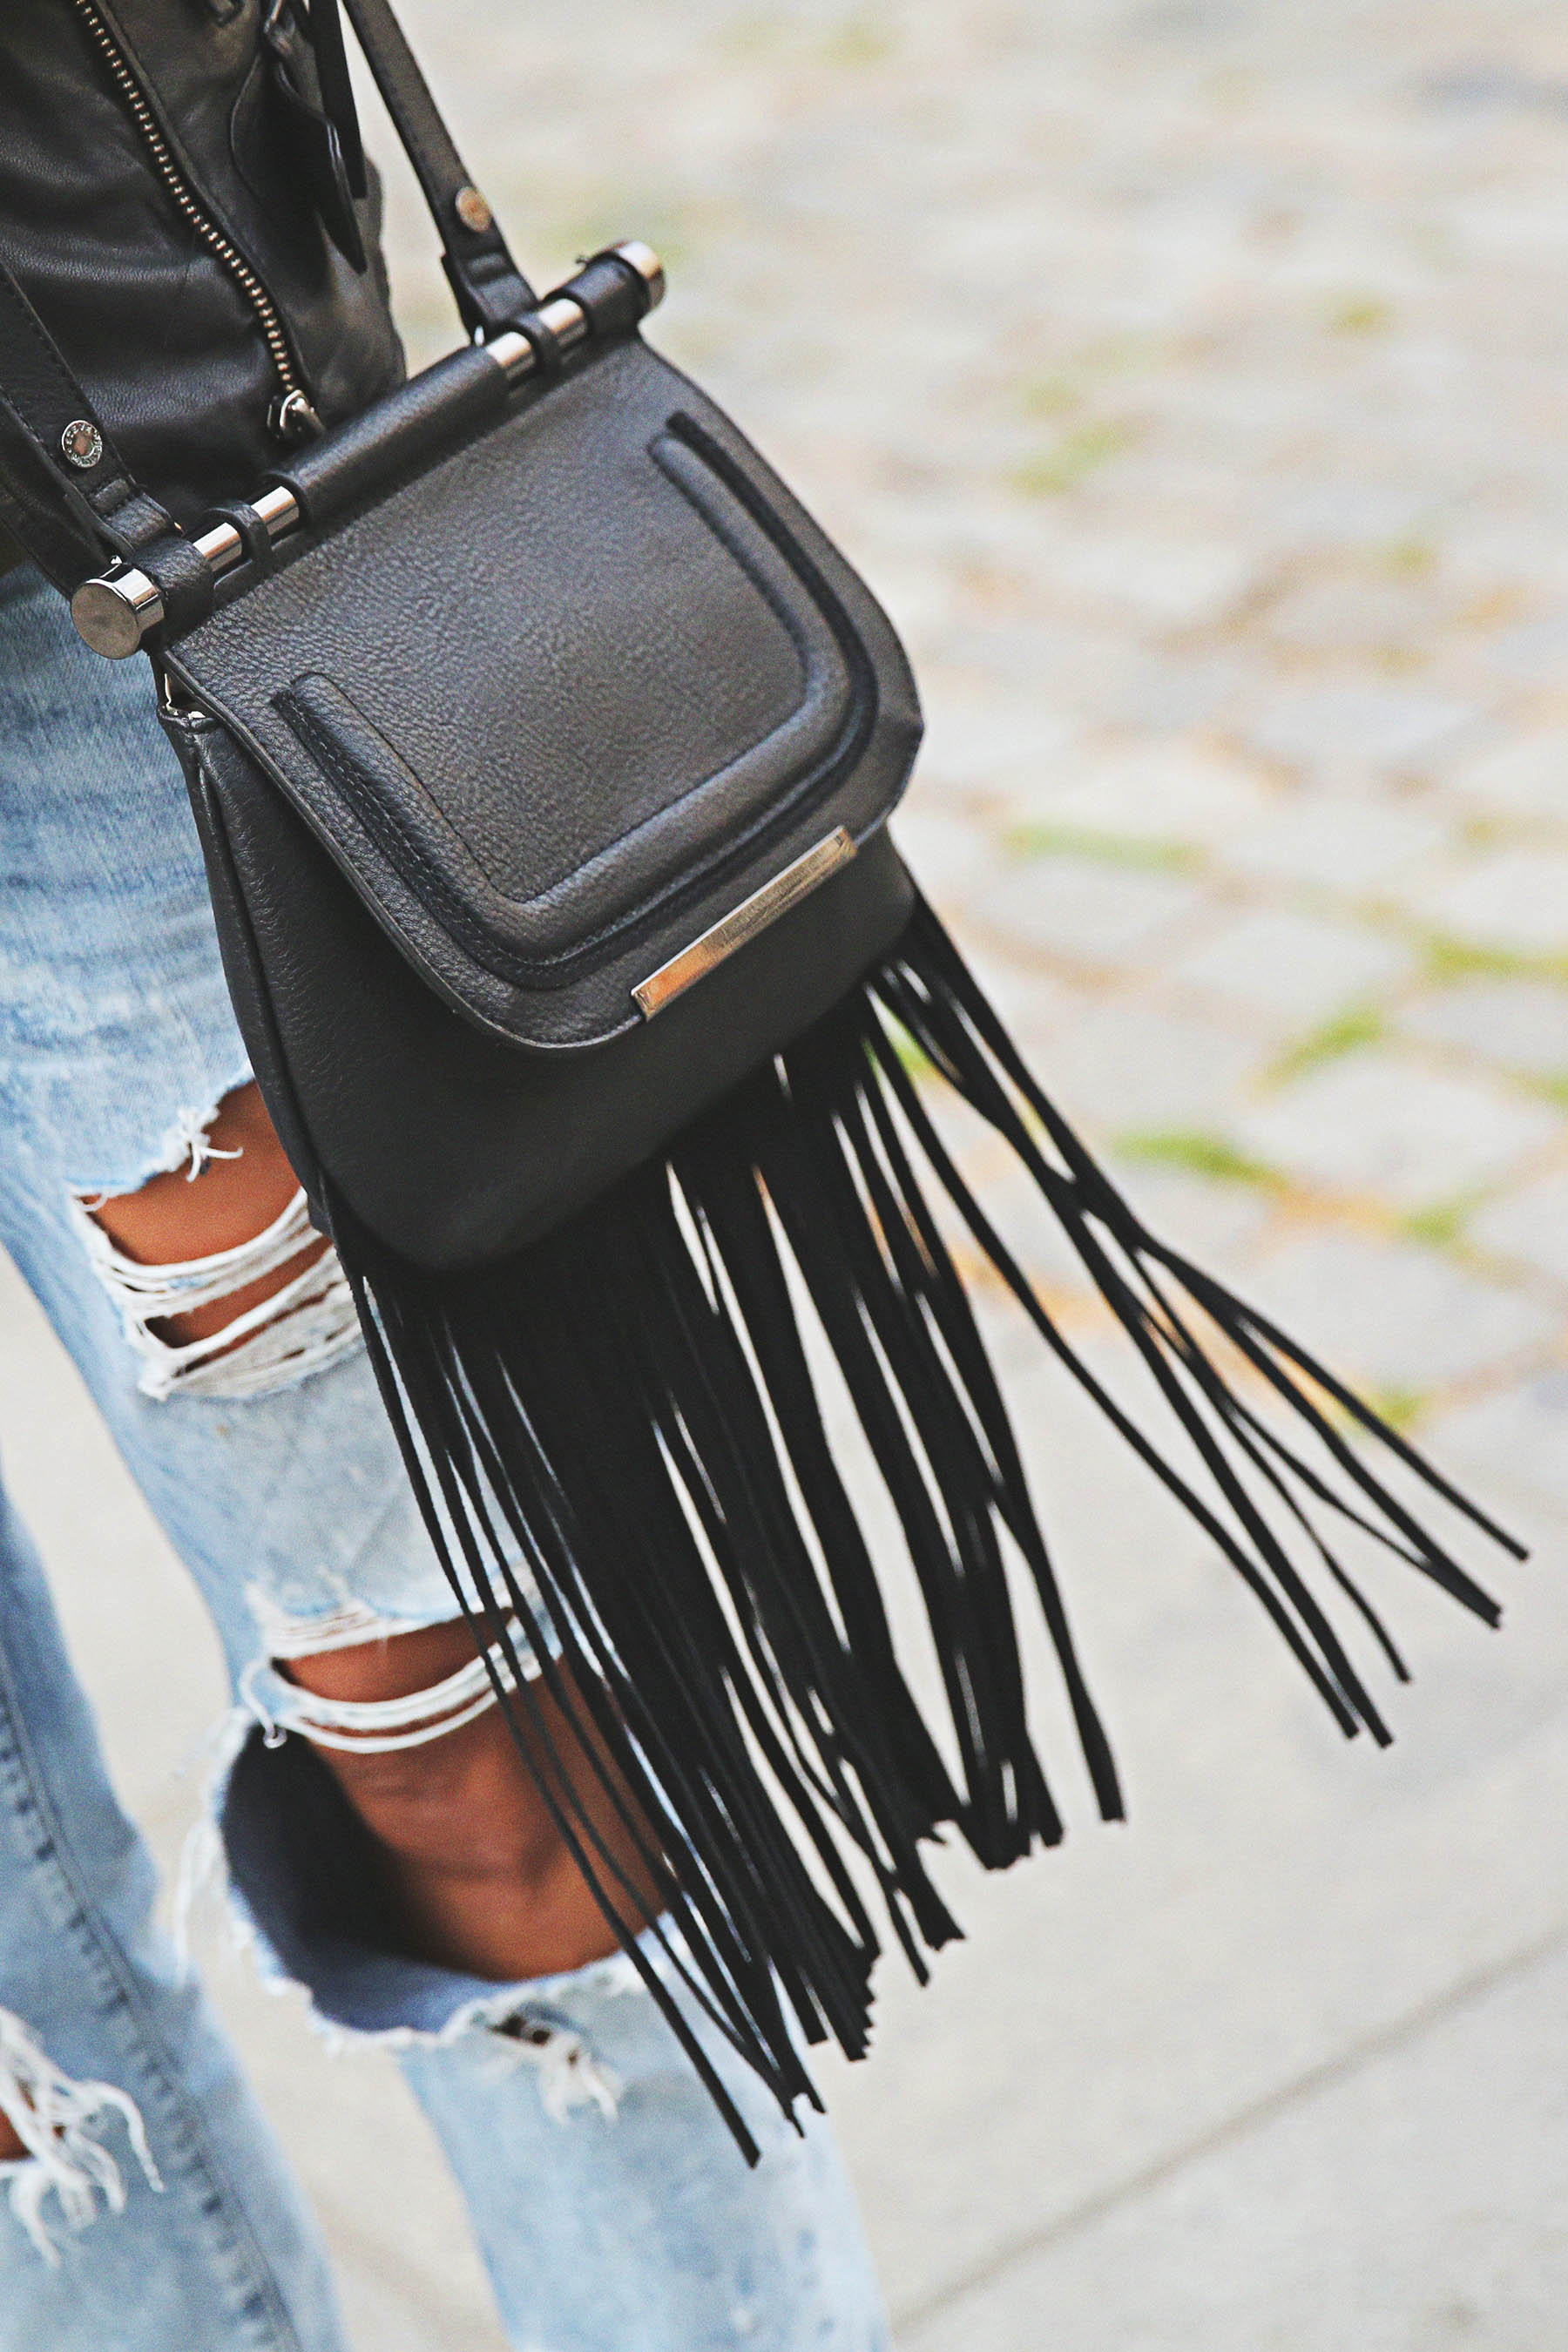 trendy-taste-look-outfit-street-style-ootd-blog-blogger-fashion-spain-moda-españa-boyfriend-vaqueros-jeans-steve-madden-sandalias-verano-primavera-leather-jacket-chaqueta-cuero-khaki-caqui-ripped-rotos-9